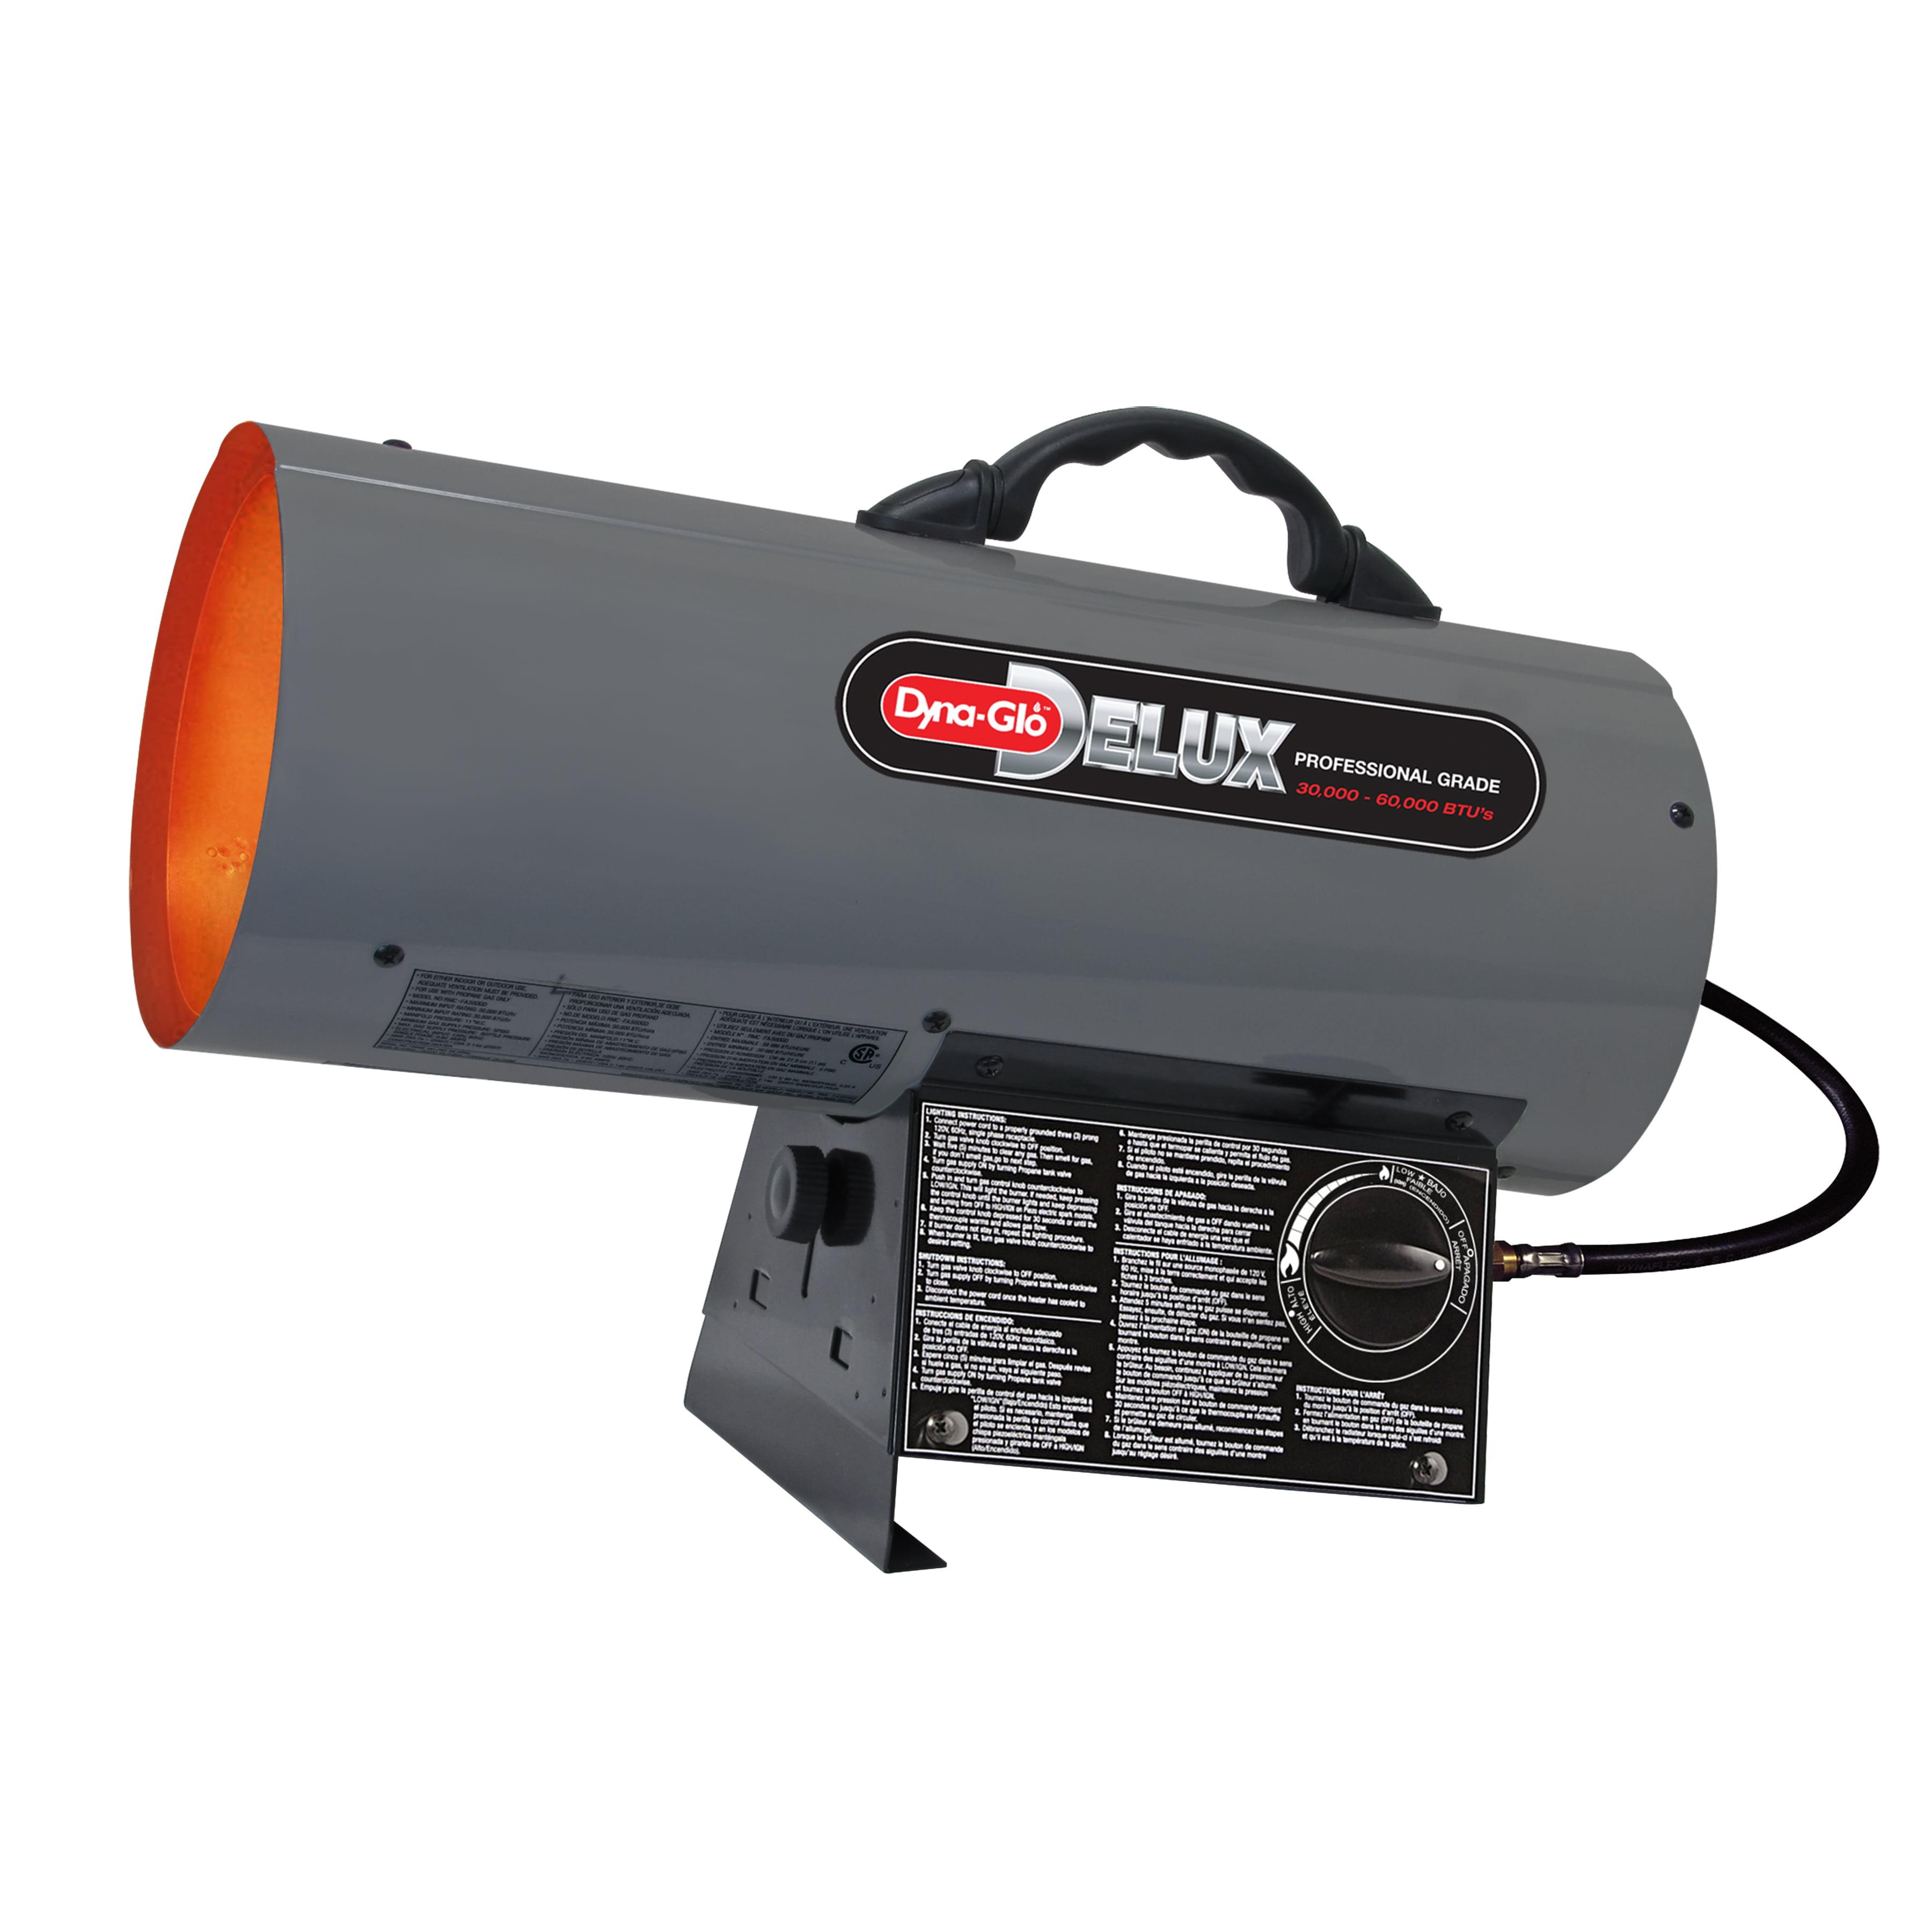 Dyna-Glo Pro 60K BTU Forced Air Propane Portable Heater